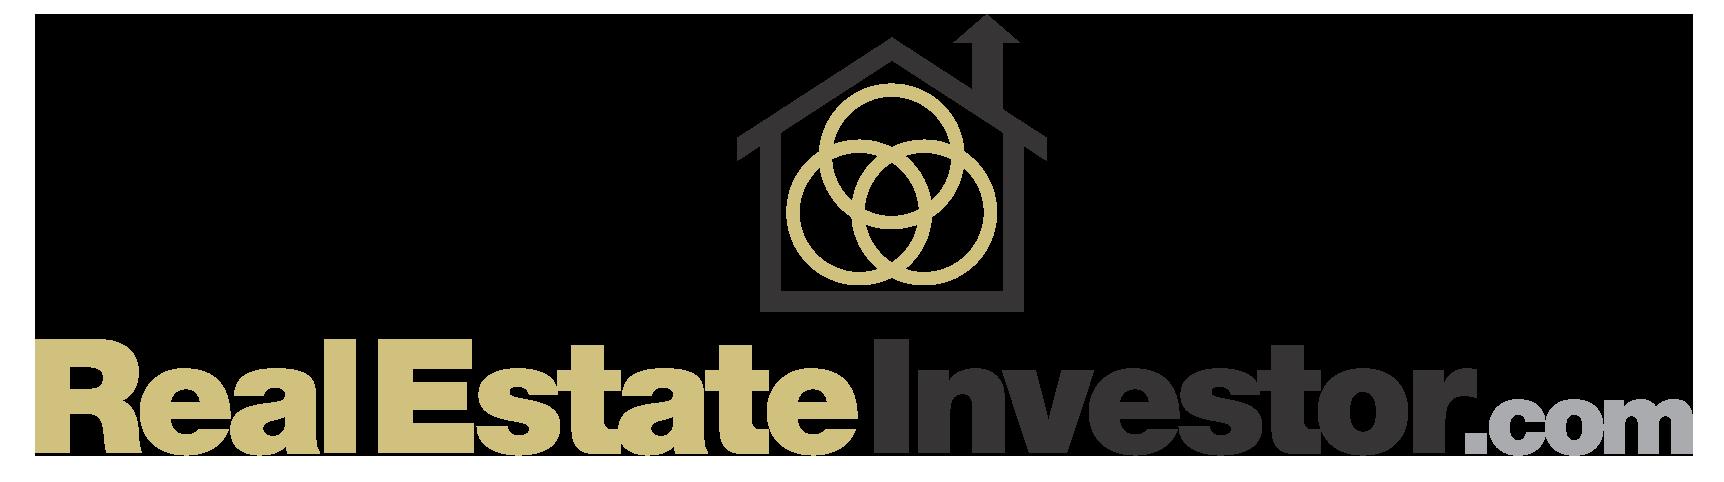 Real-Estate-Investor-LOGO